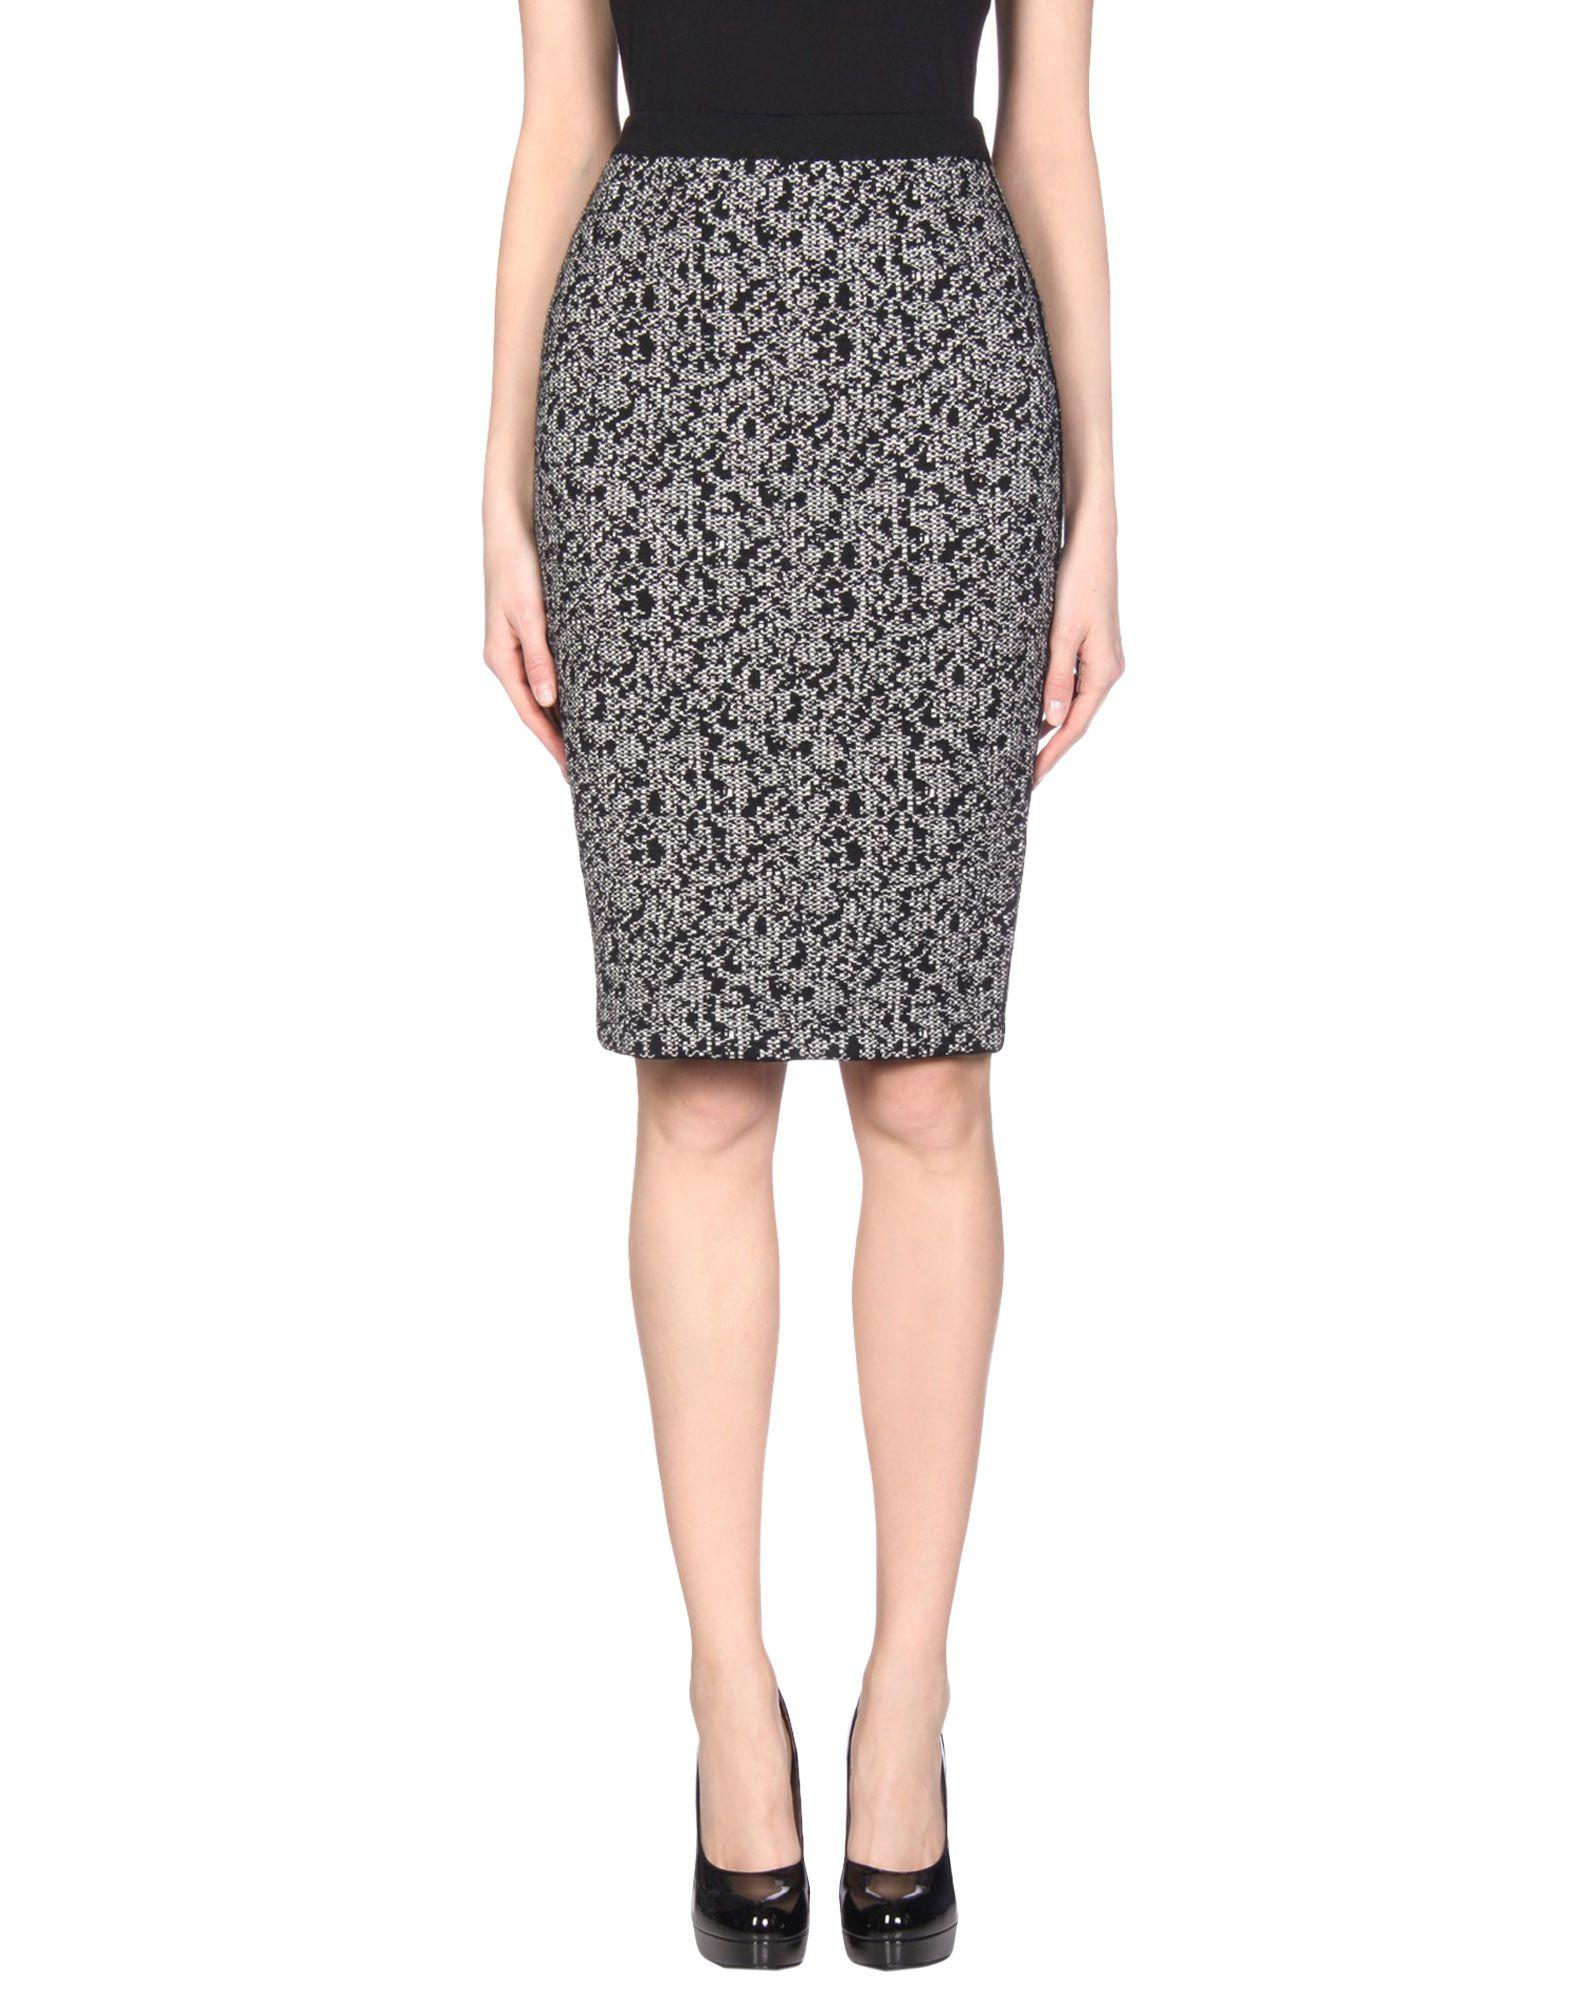 Oscar De La Renta Knee Length Skirt In Black